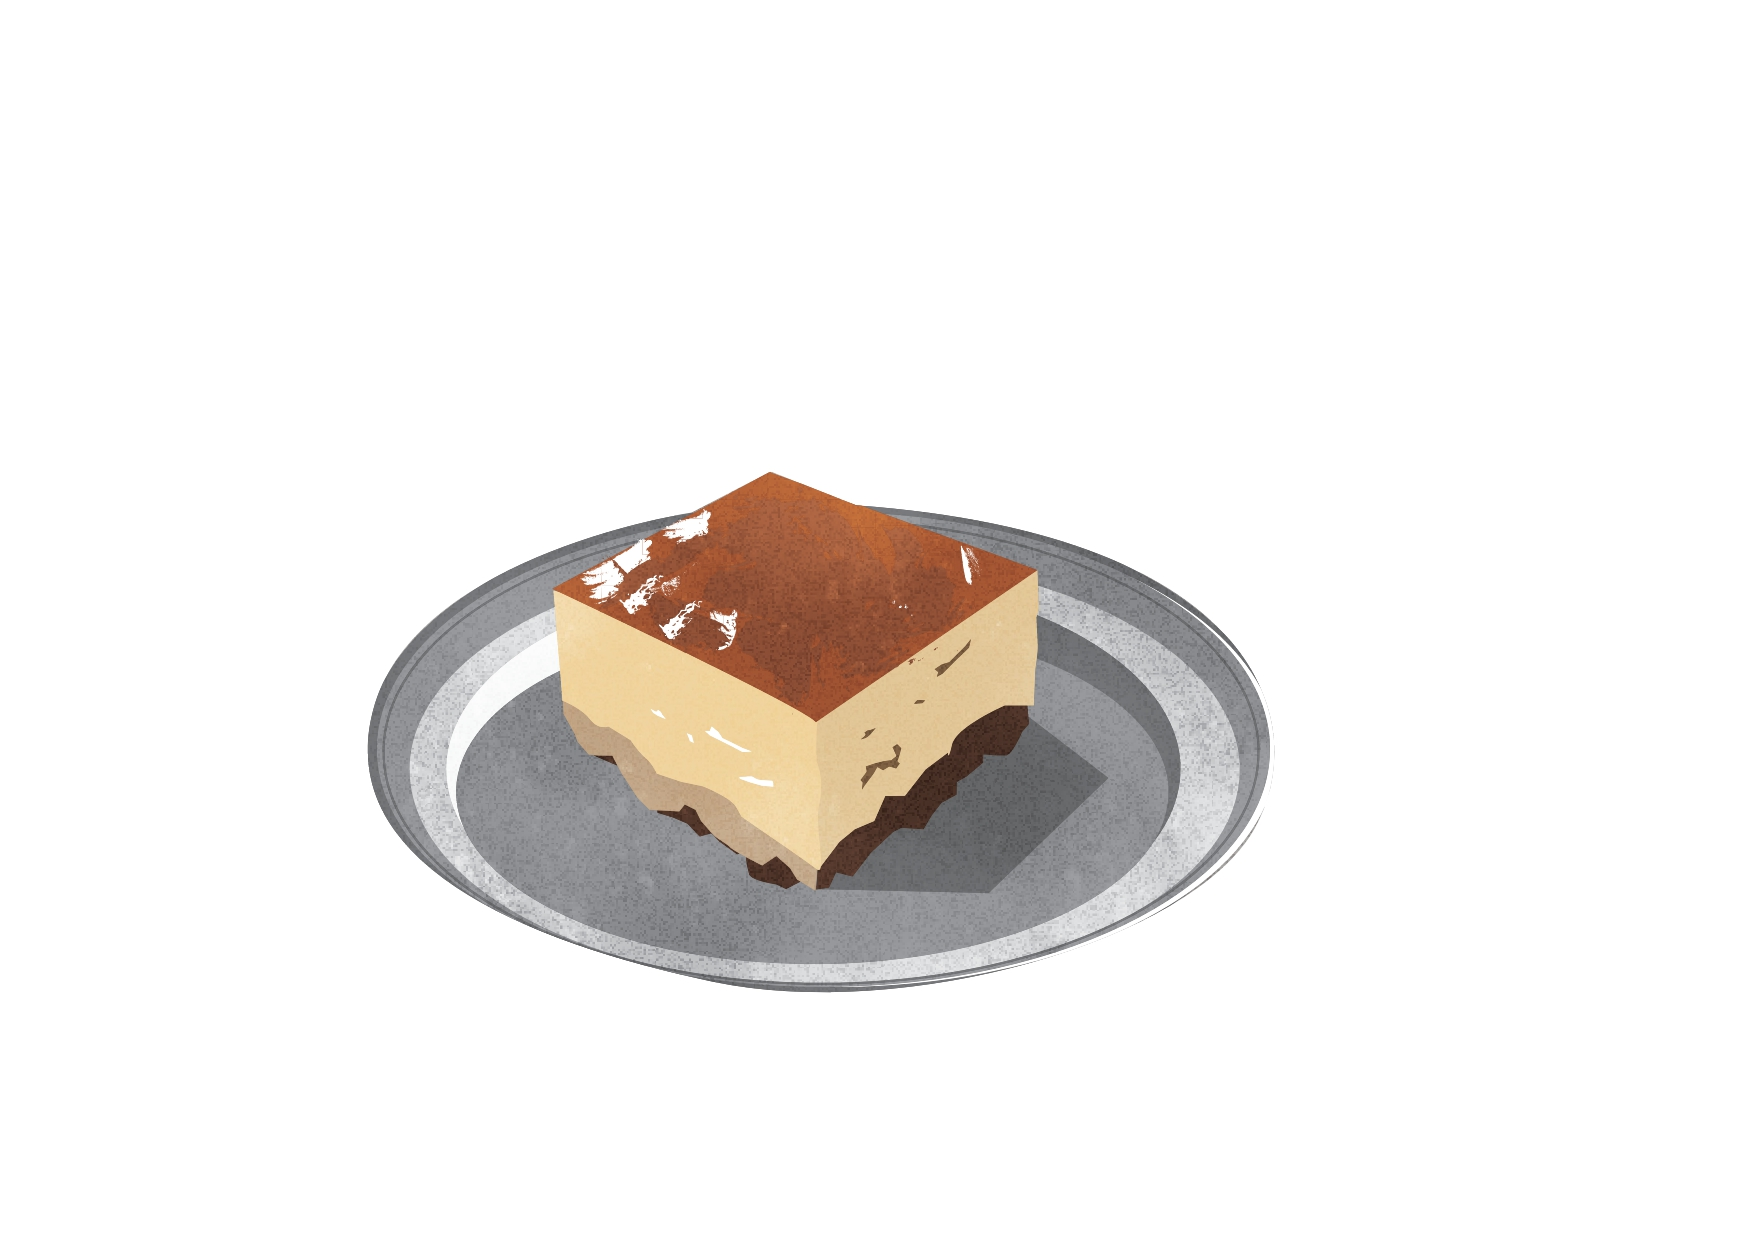 "【RENO CAFE SWEETSレシピ】No.5 ‶TIME"" しっとりまろやか『ダブルチーズケーキ』"